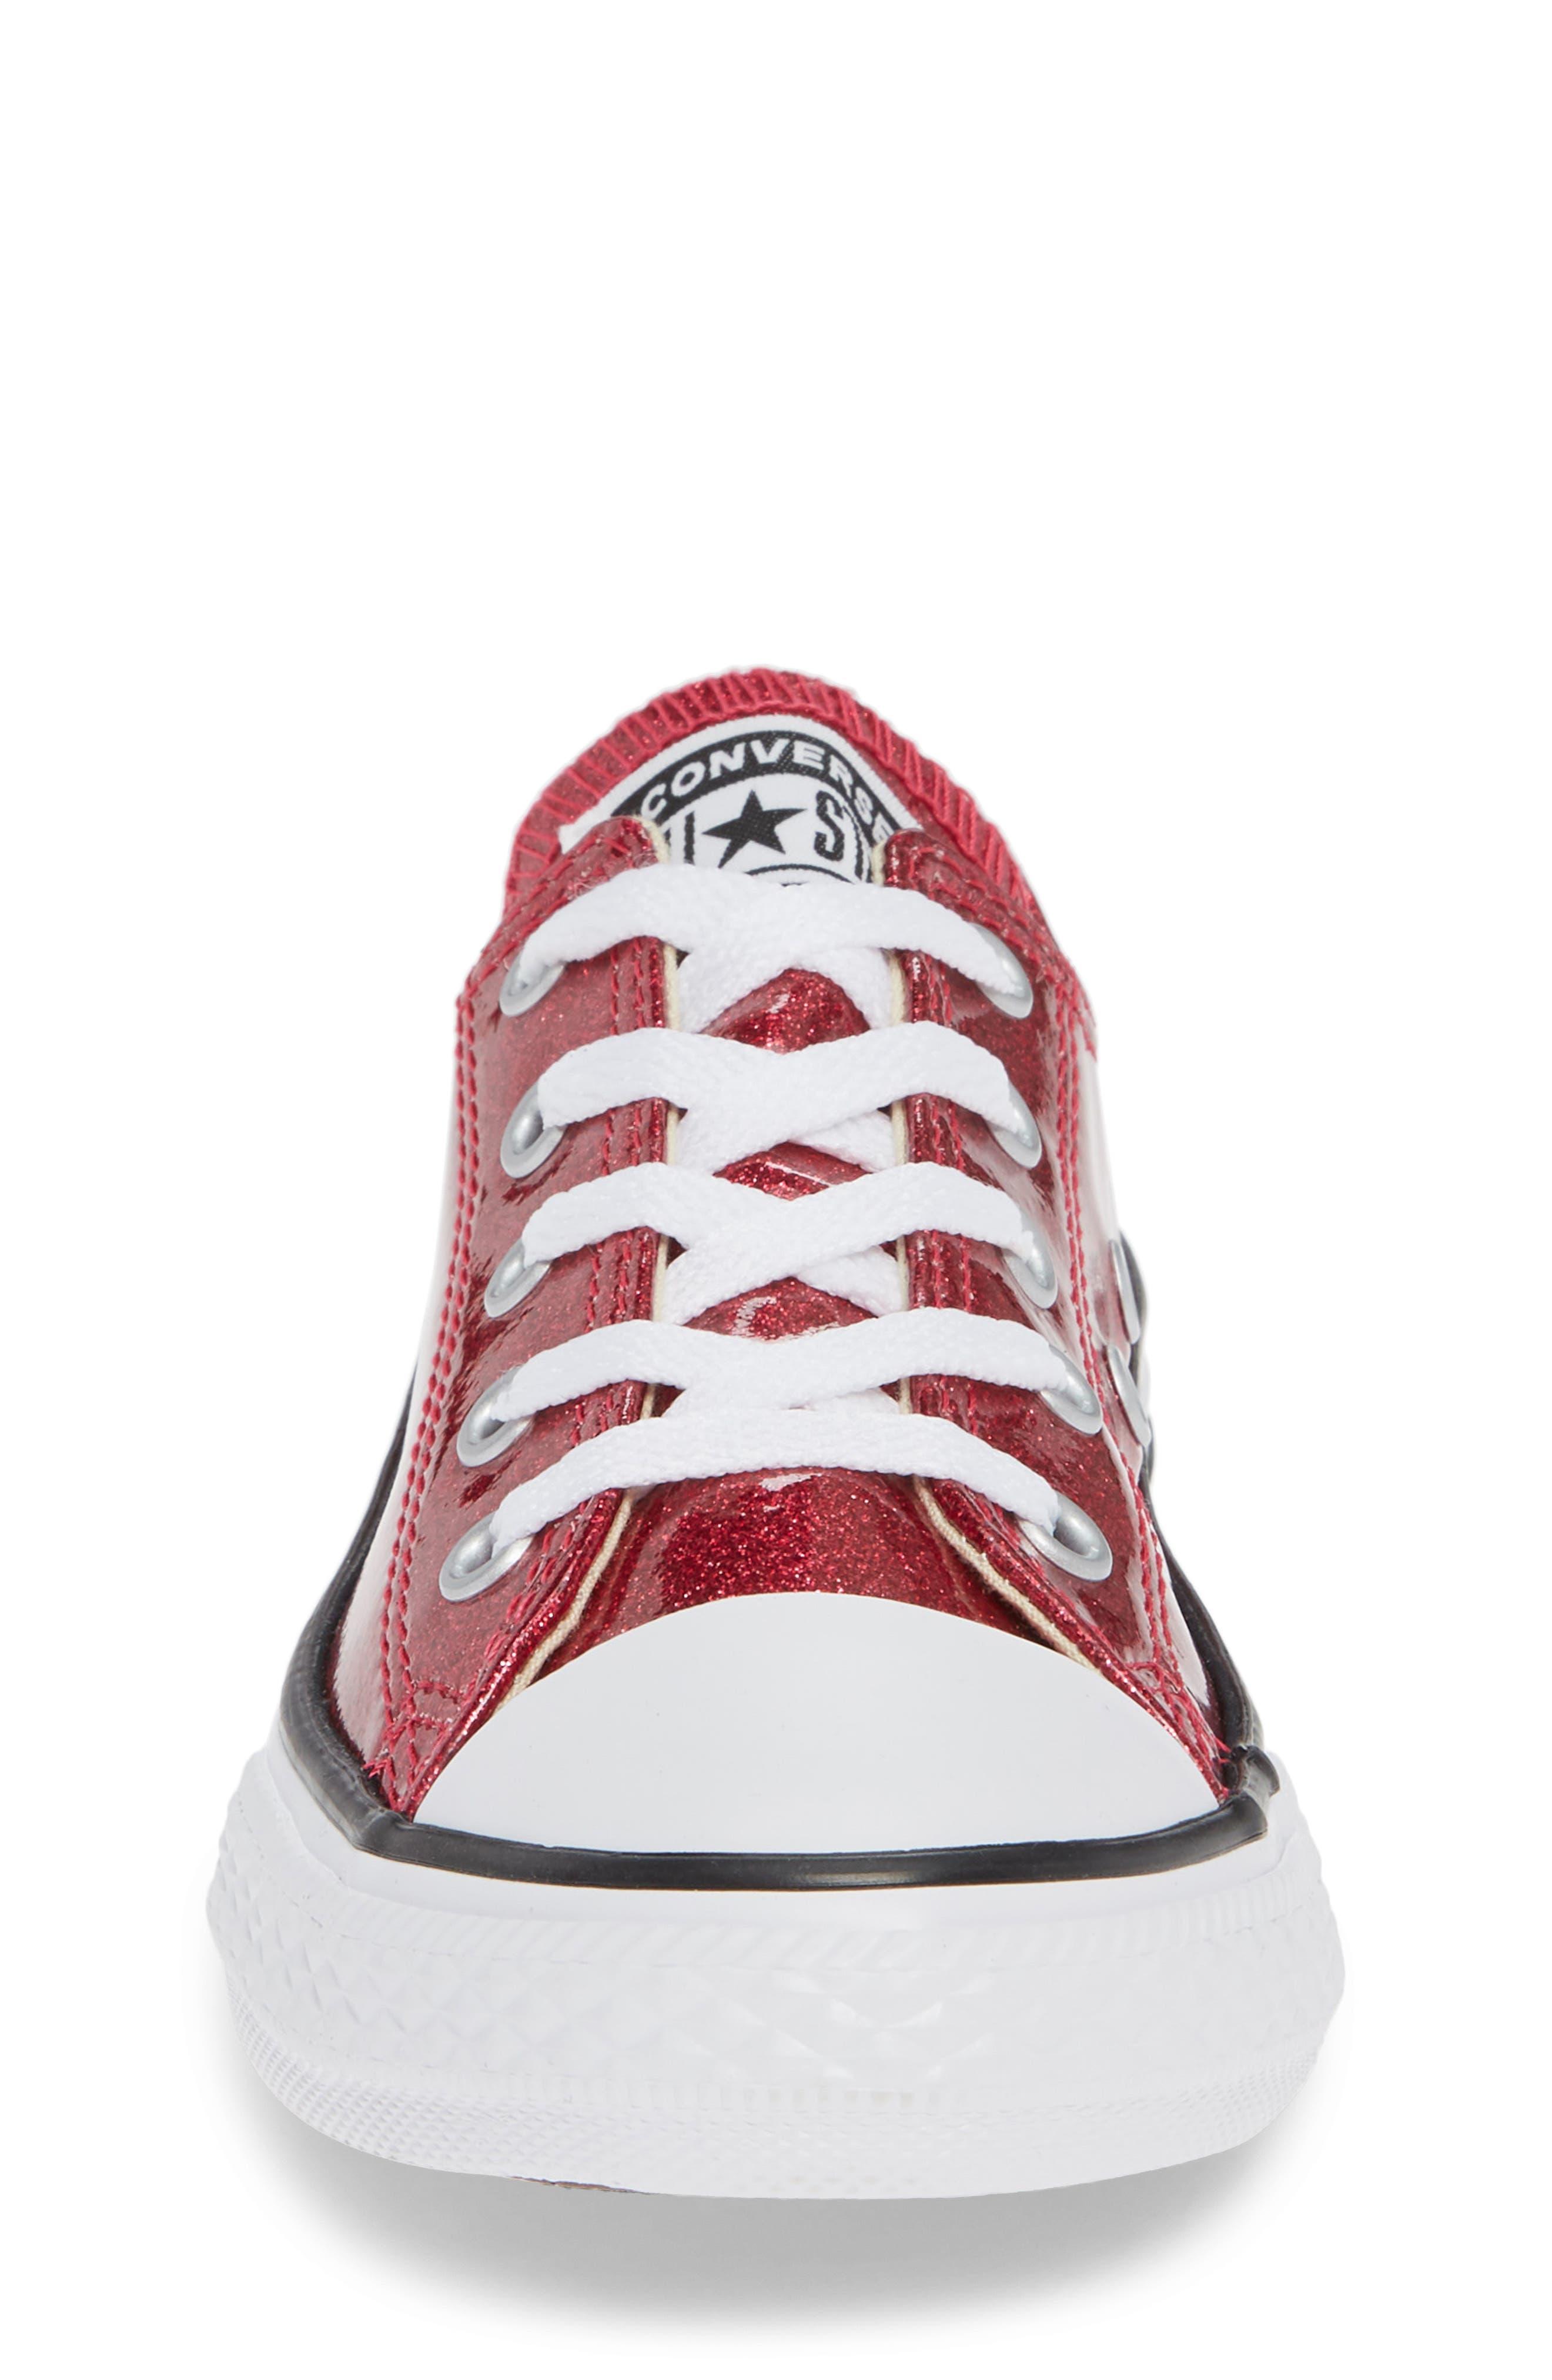 All Star<sup>®</sup> Seasonal Glitter OX Low Top Sneaker,                             Alternate thumbnail 4, color,                             PINK POP